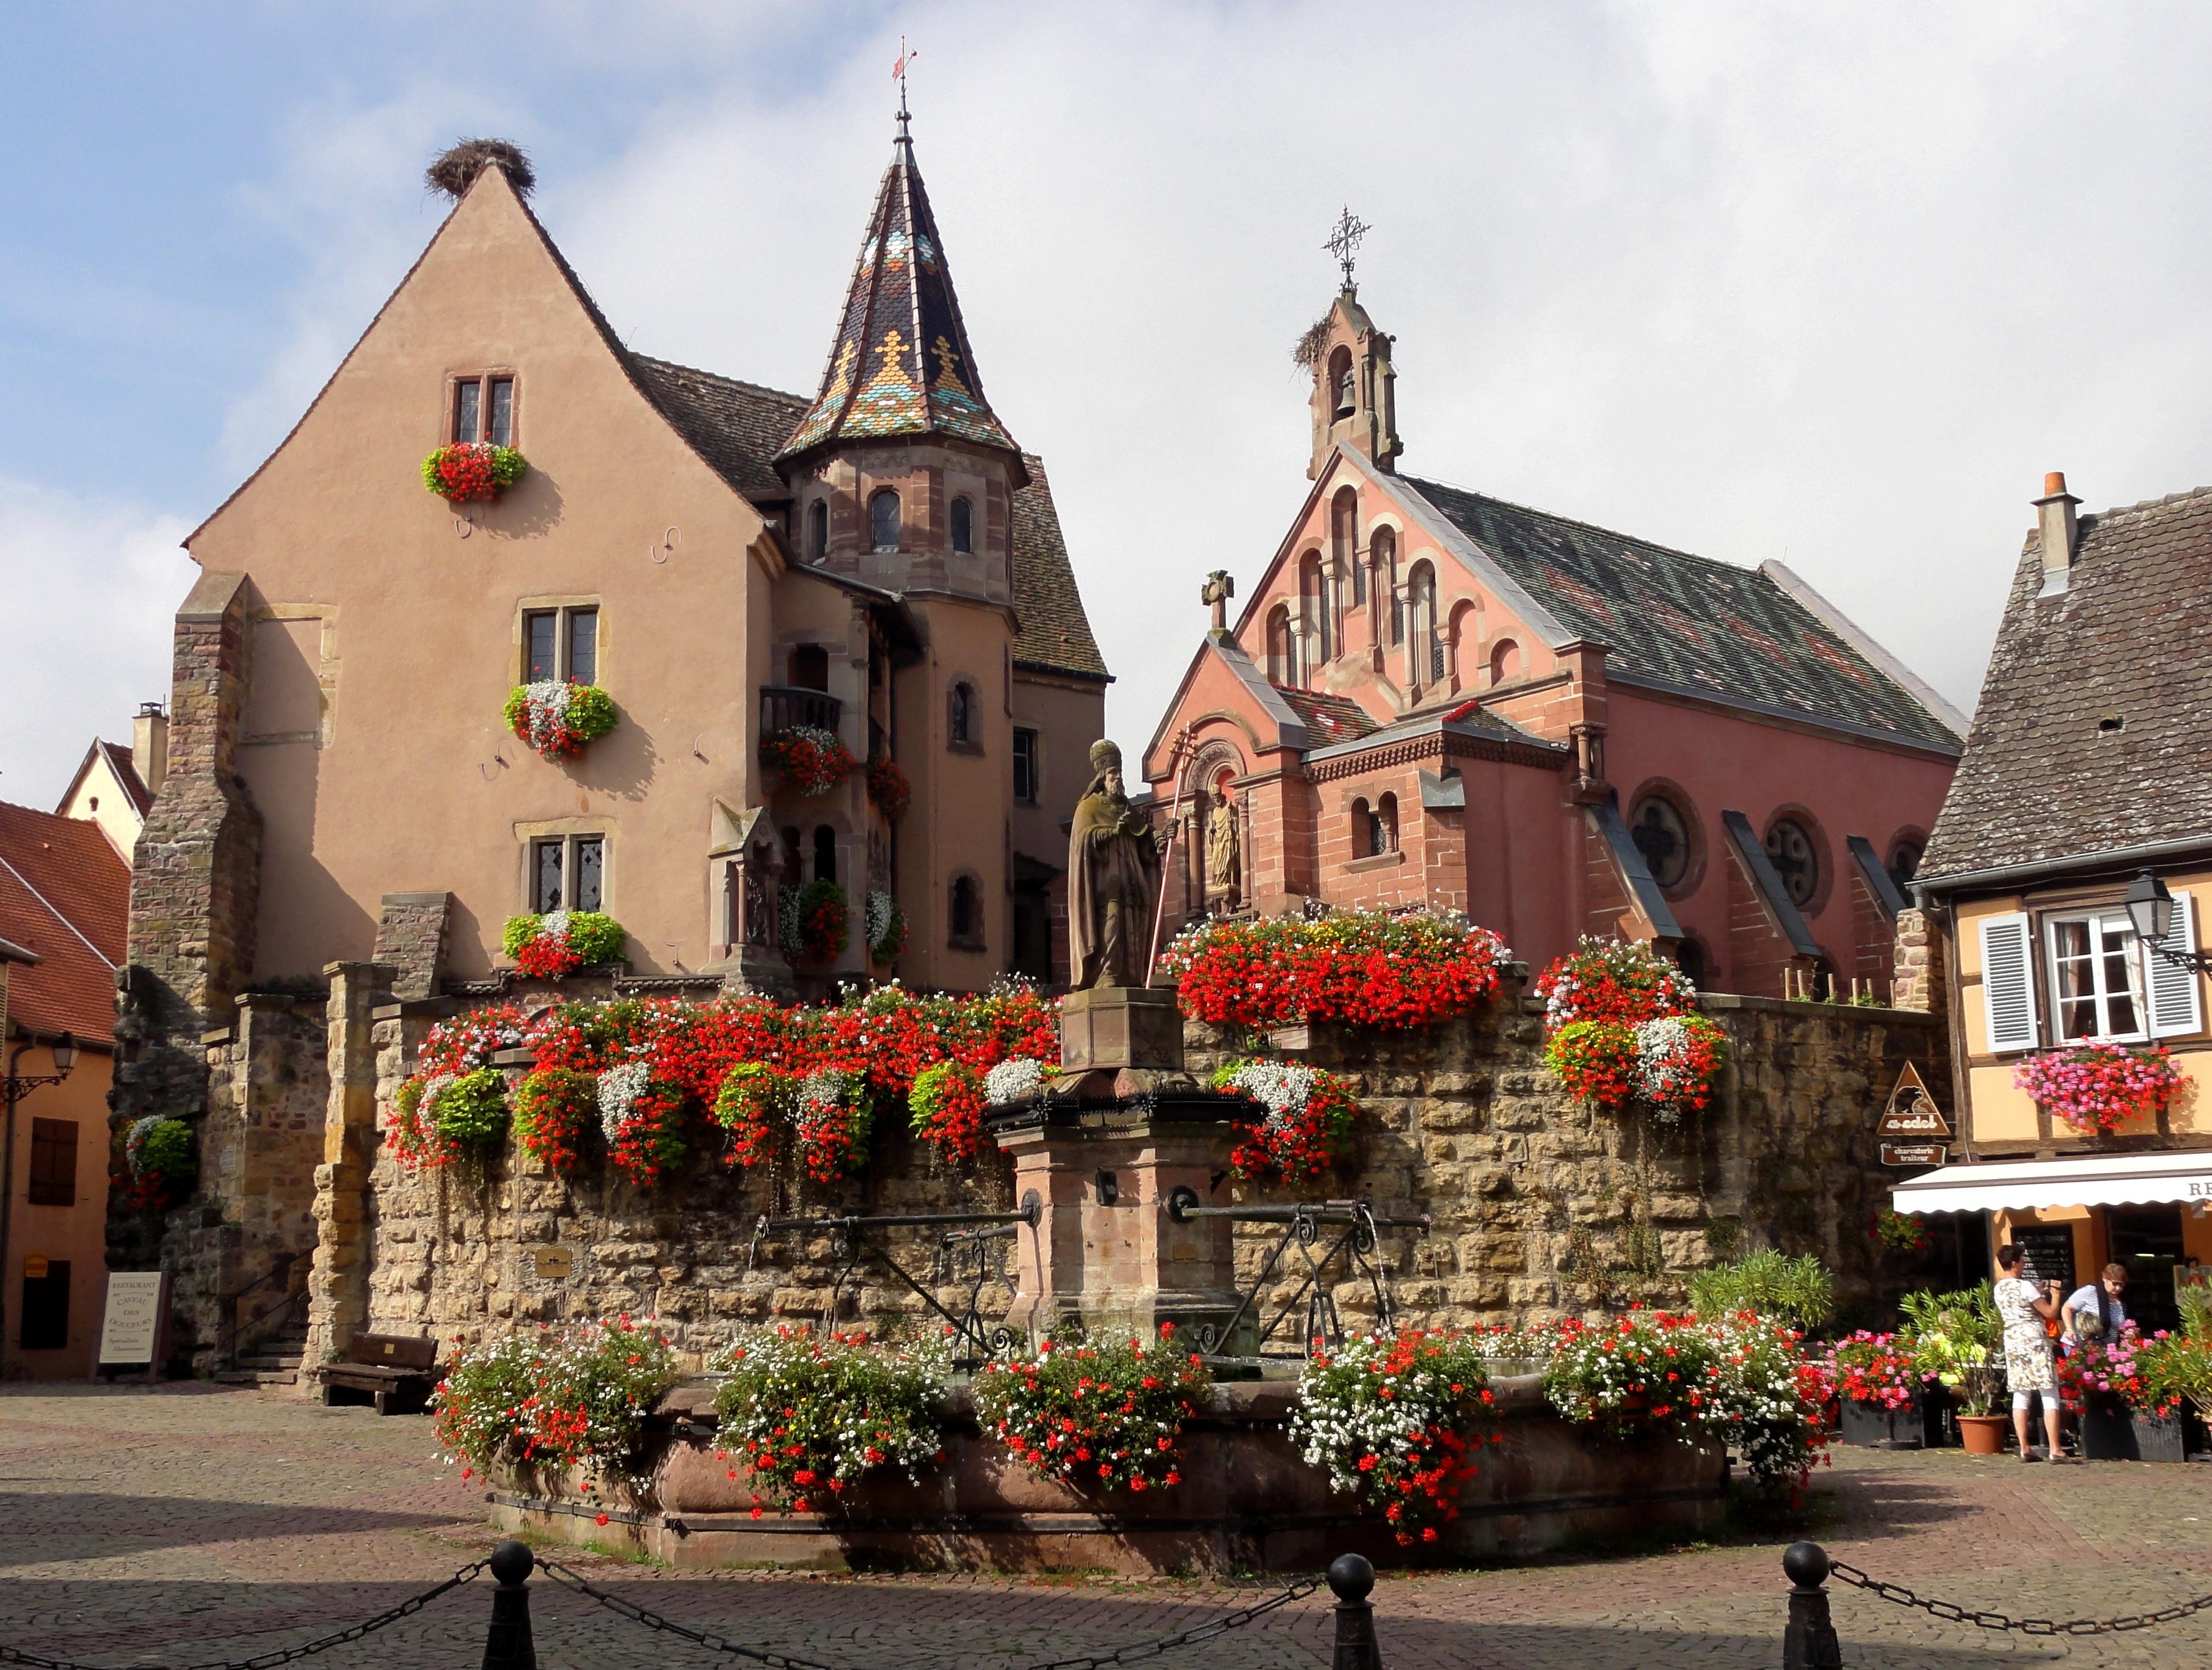 https://upload.wikimedia.org/wikipedia/commons/e/eb/Eguisheim_Ch%C3%A2teauStL%C3%A9on_01.JPG?uselang=fr